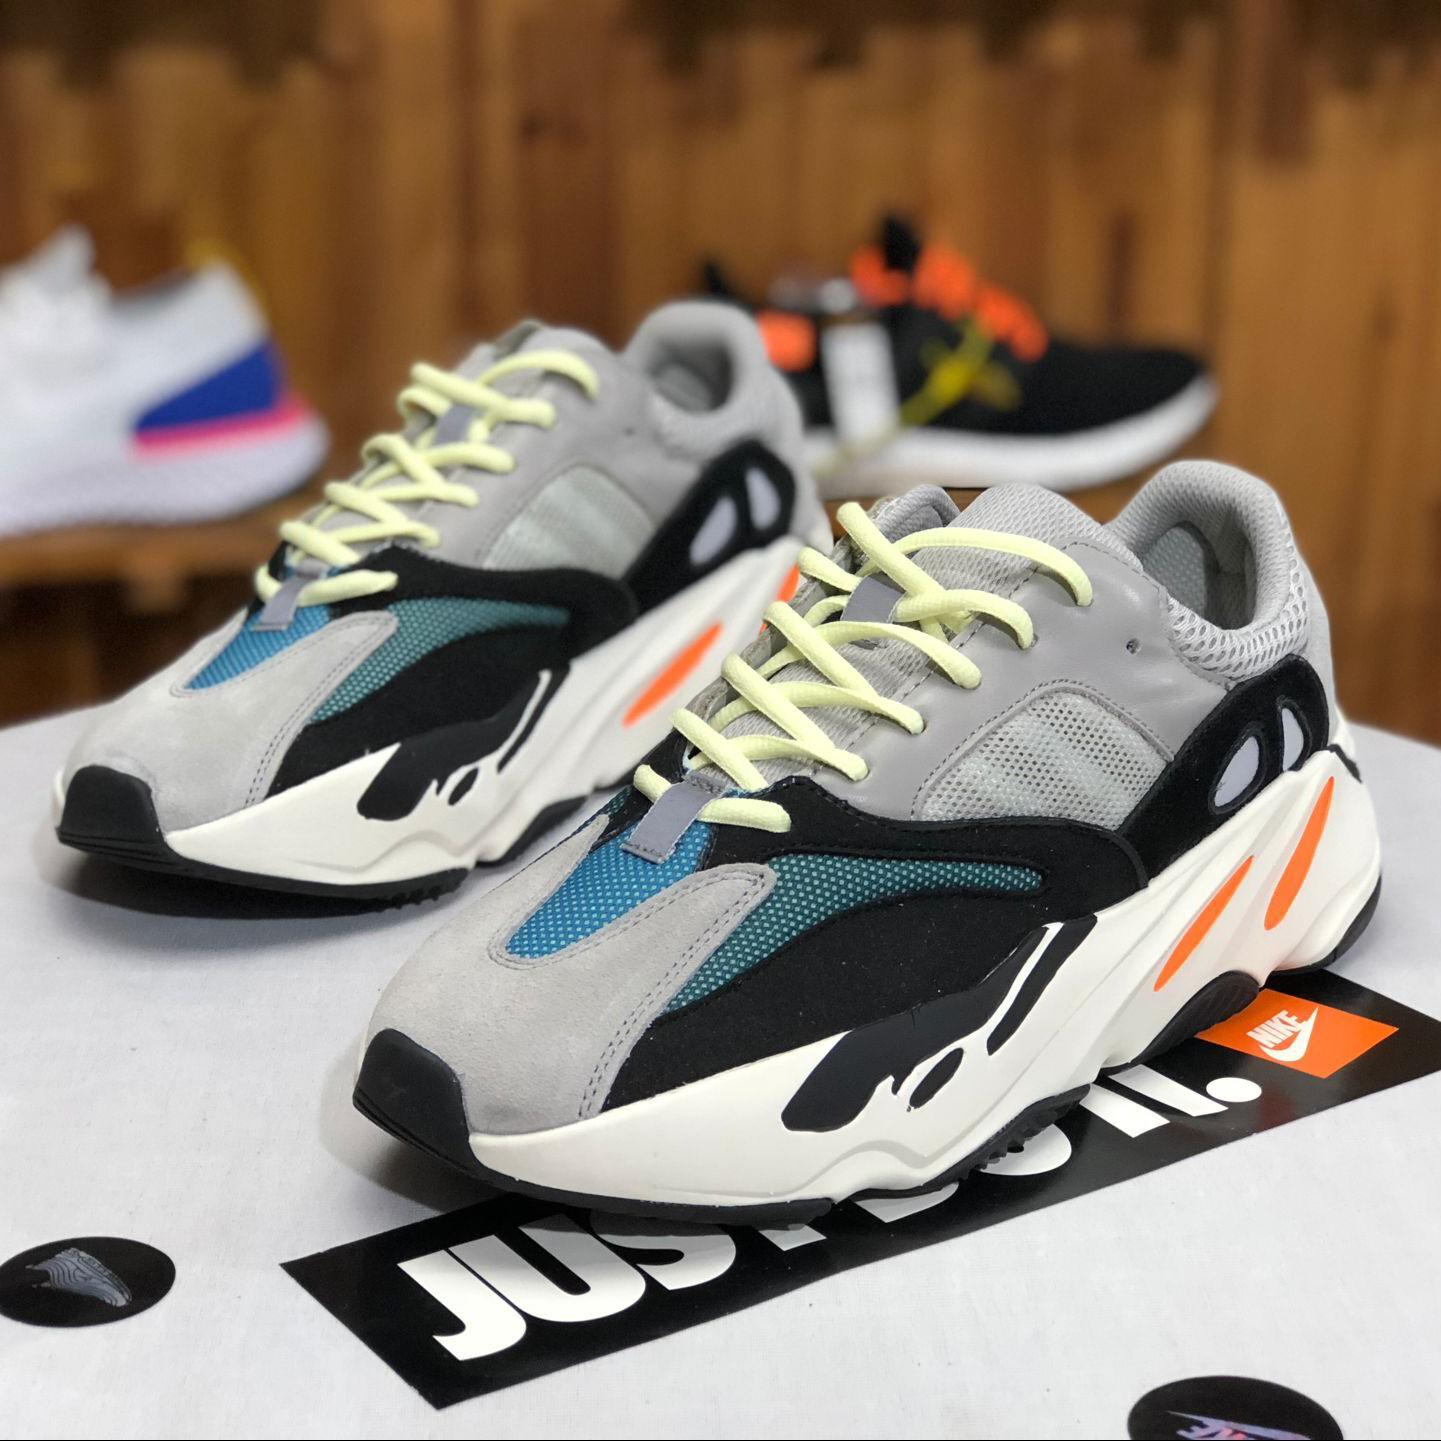 yeezy 700 lazada Shop Clothing \u0026 Shoes